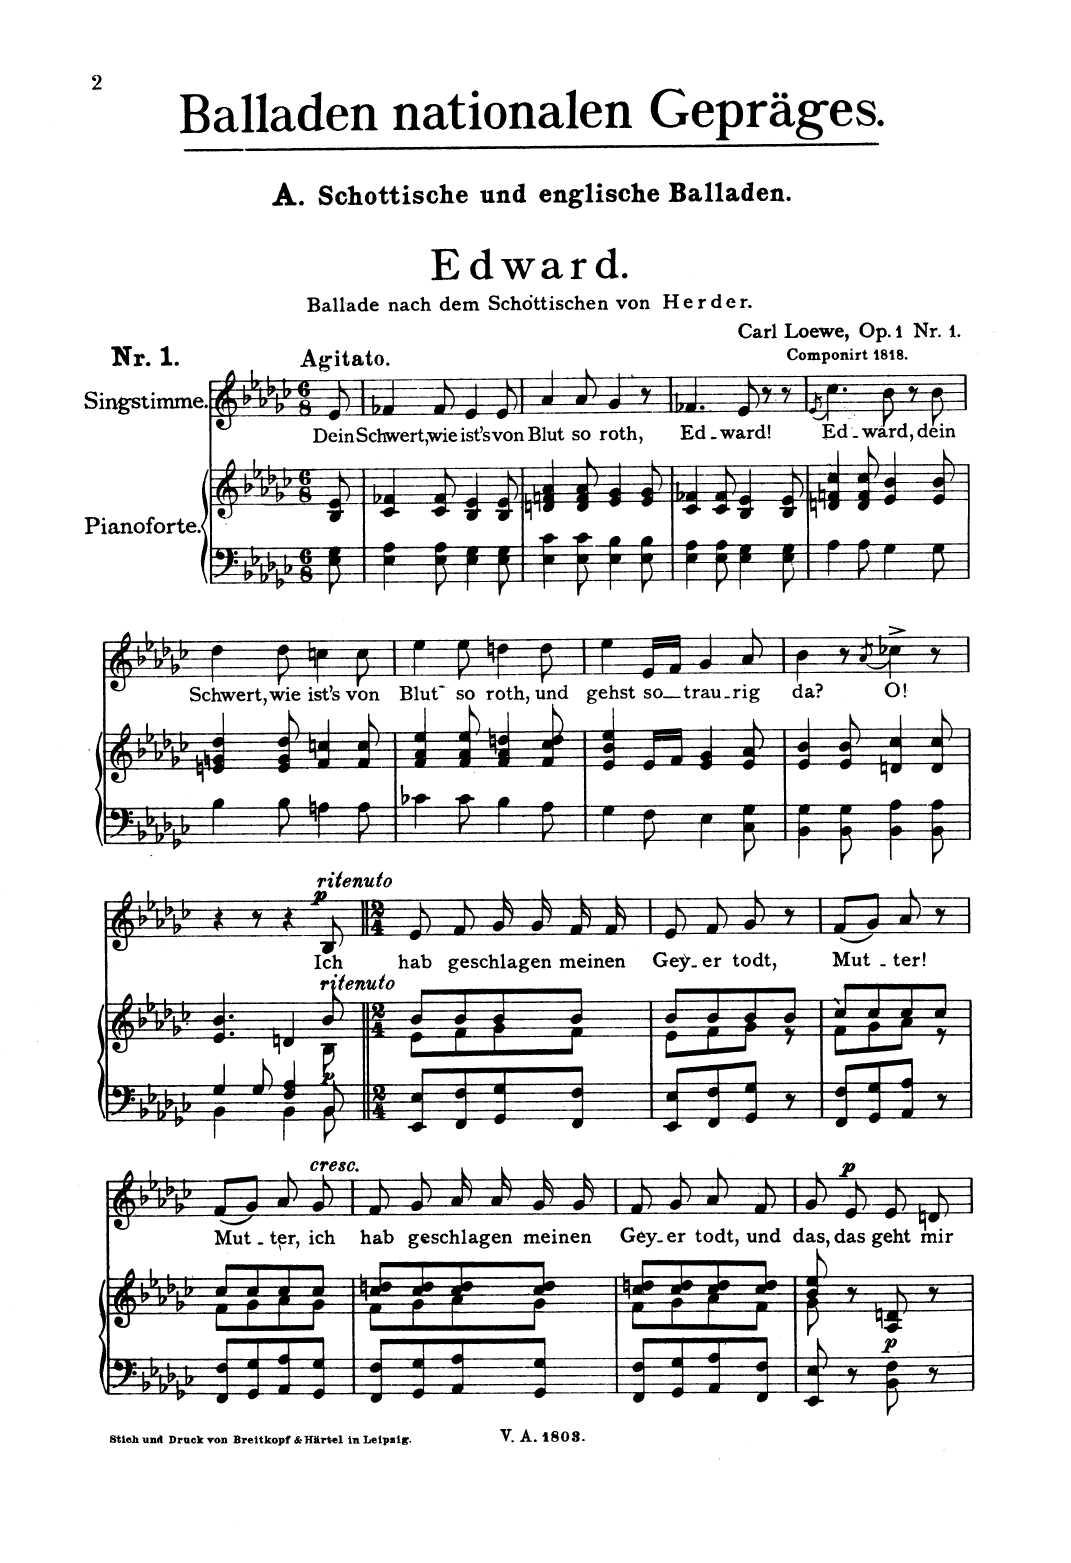 Loewe, Edward